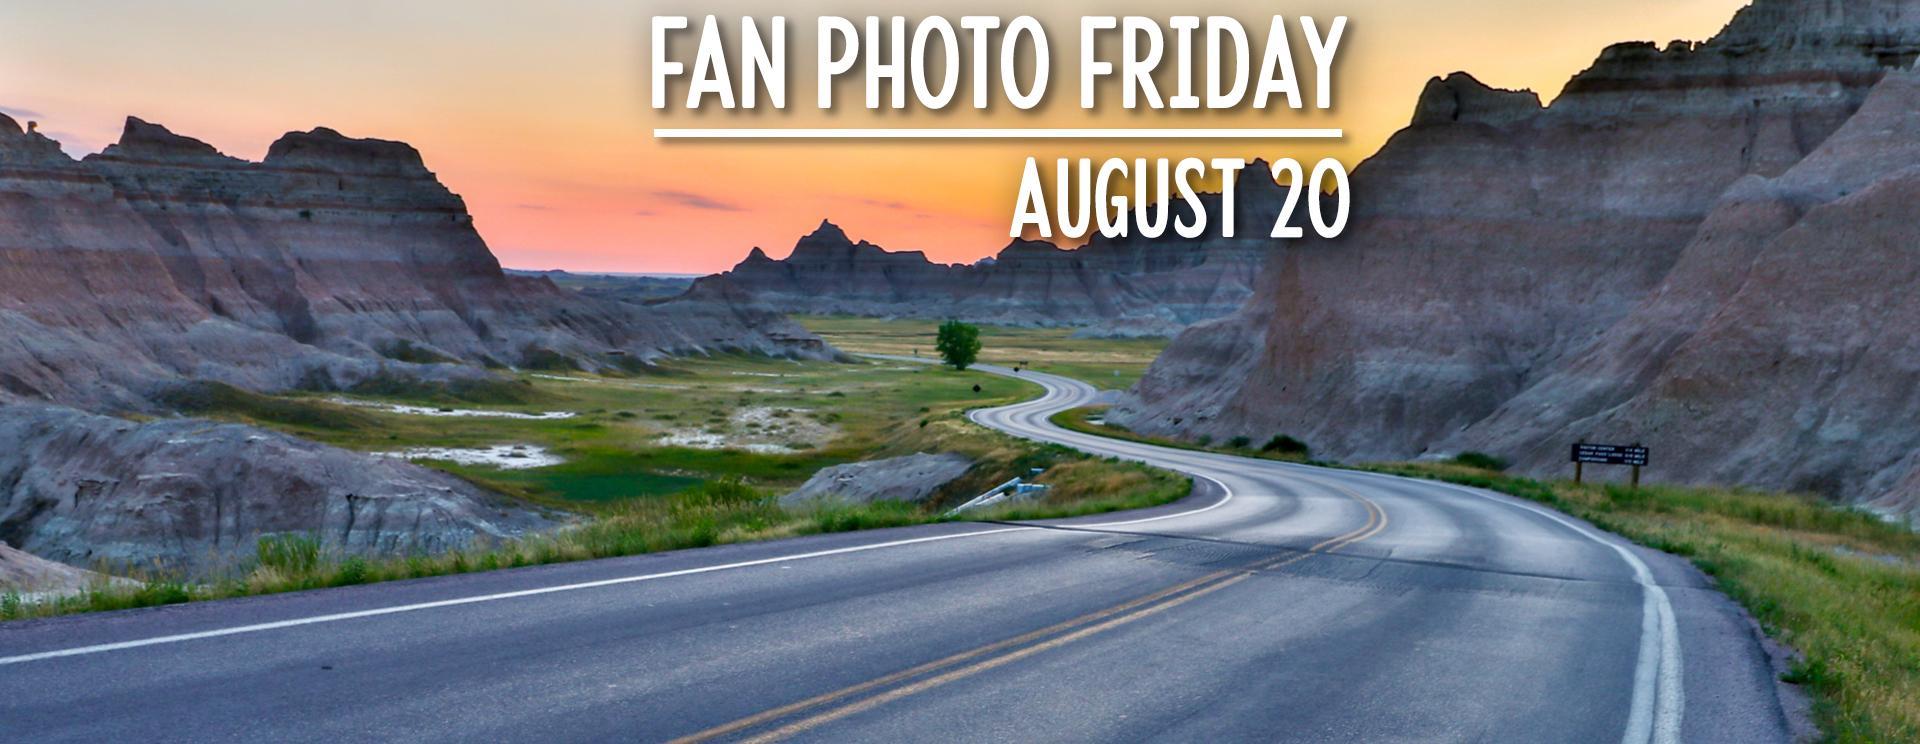 Fan Photo Friday | Aug. 20, 2021